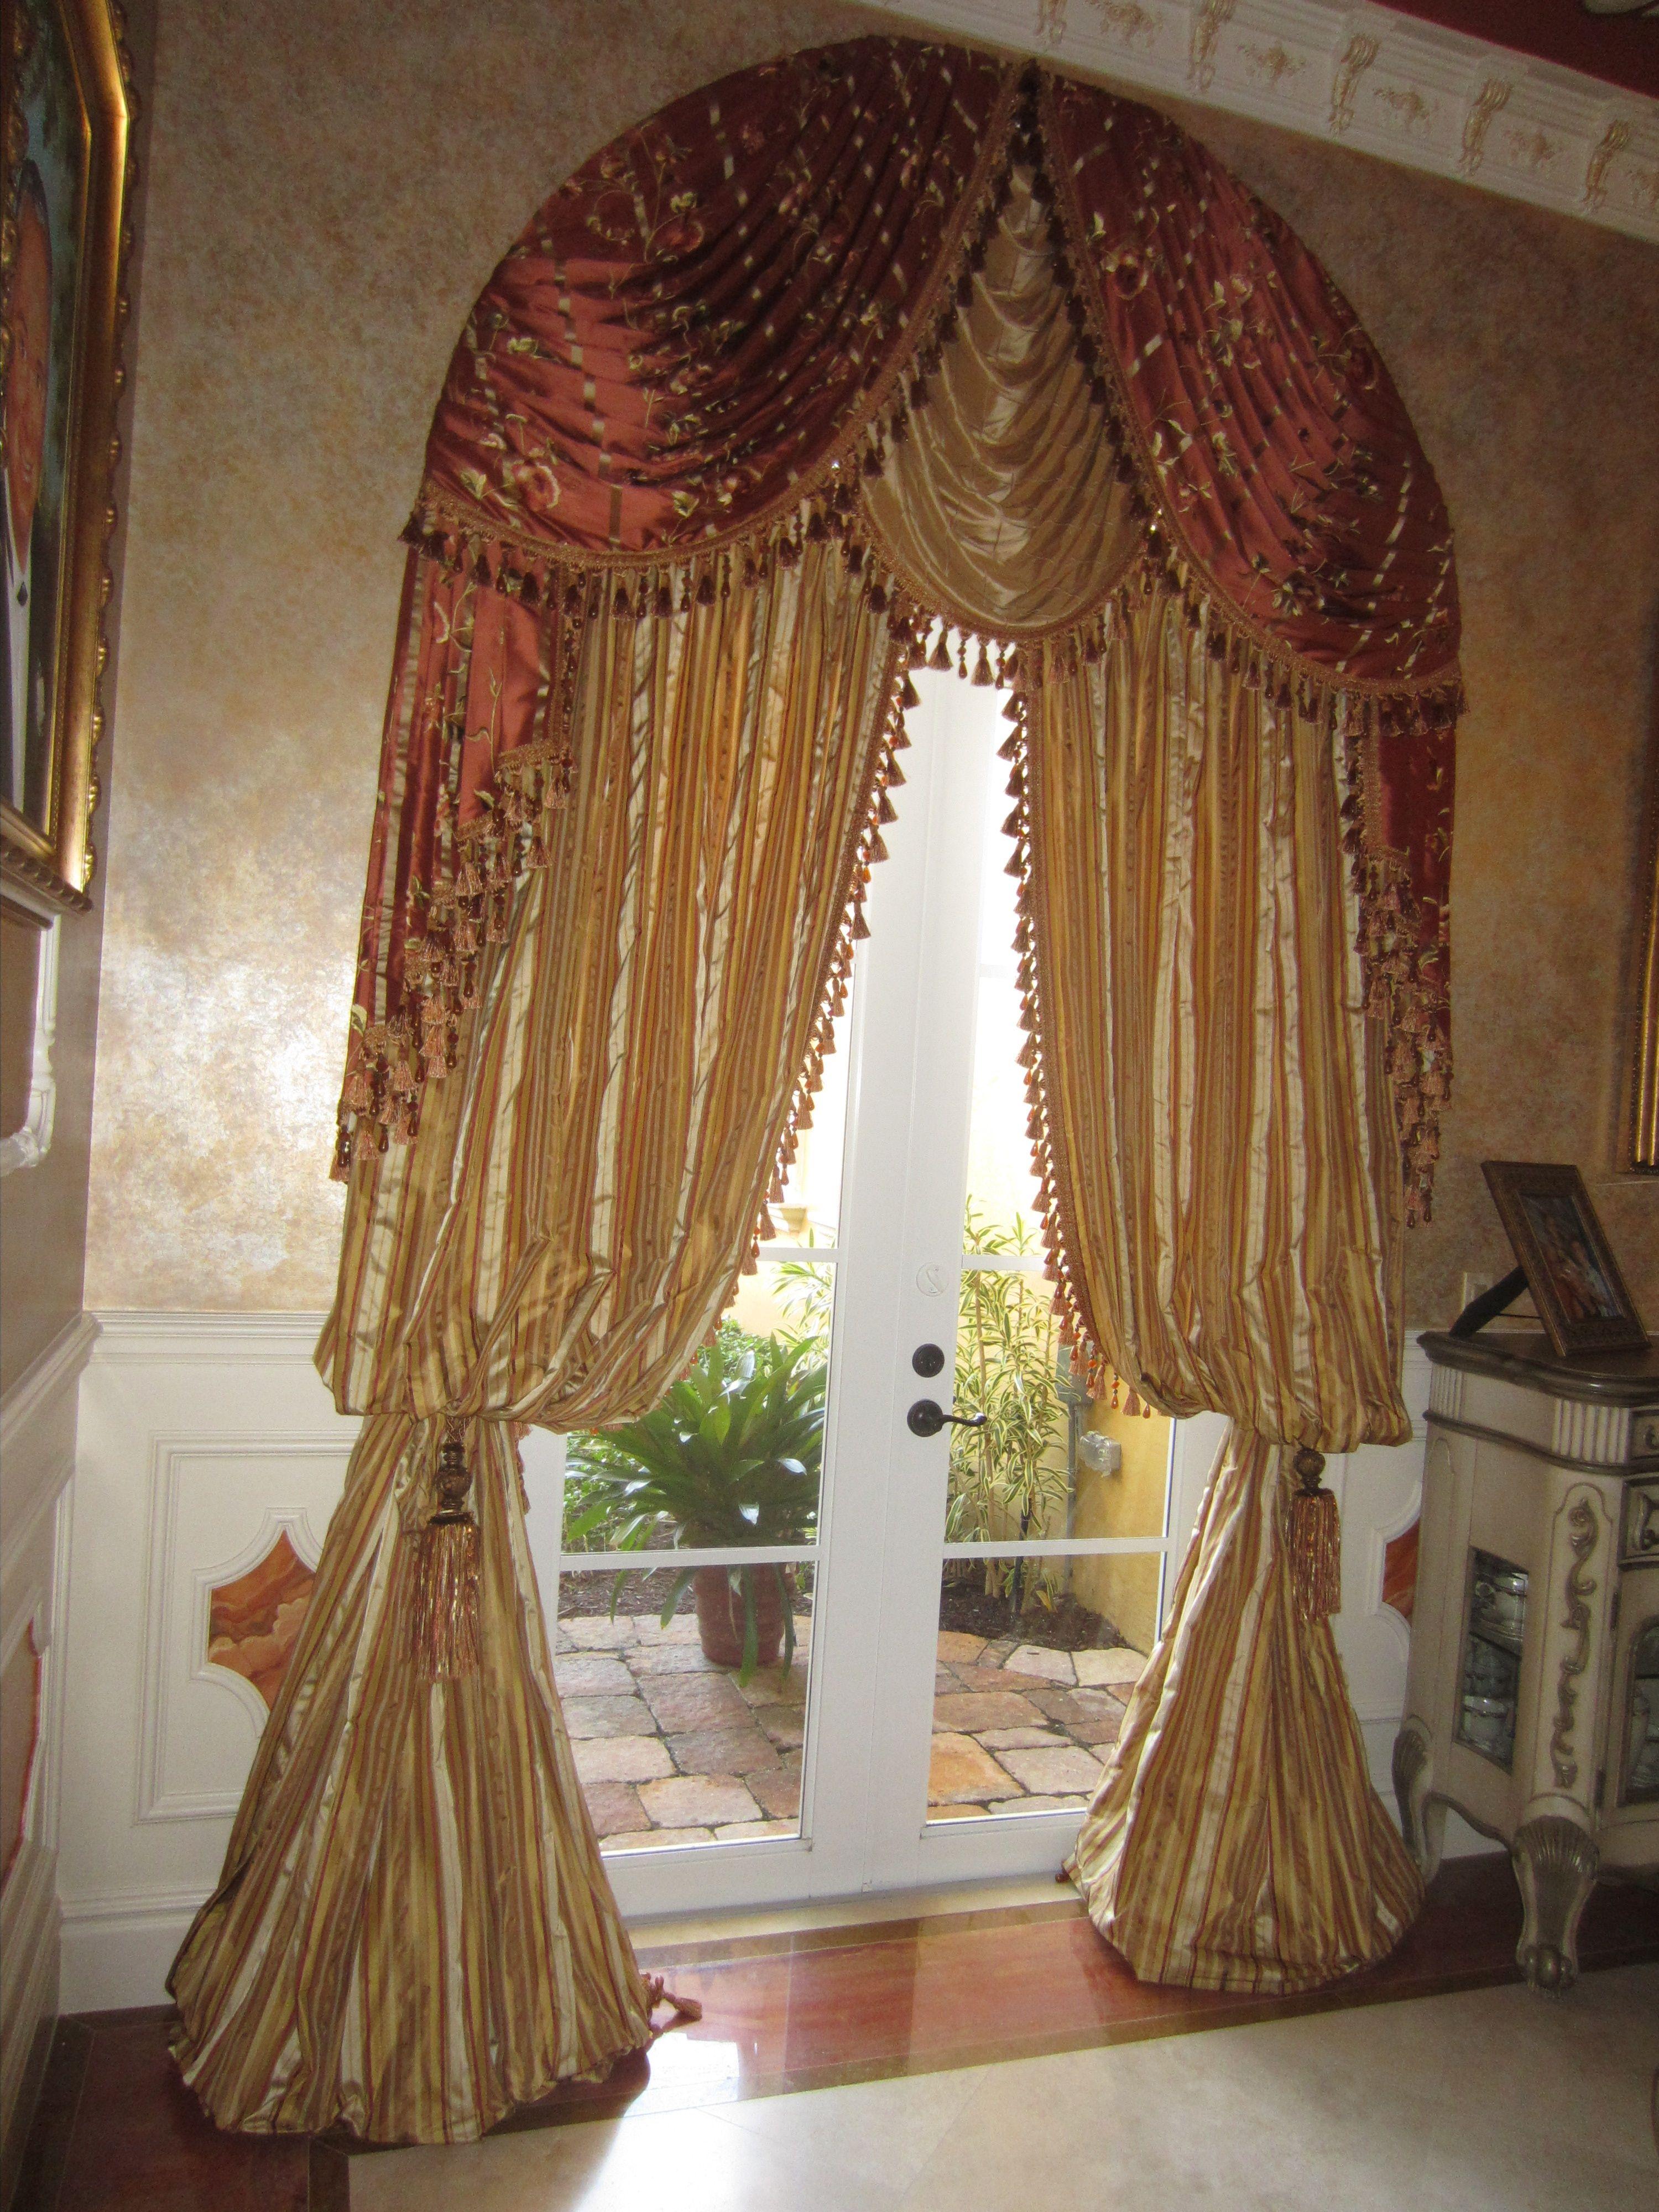 Edward S Window Decor North Palm Beach Florida Curtains For